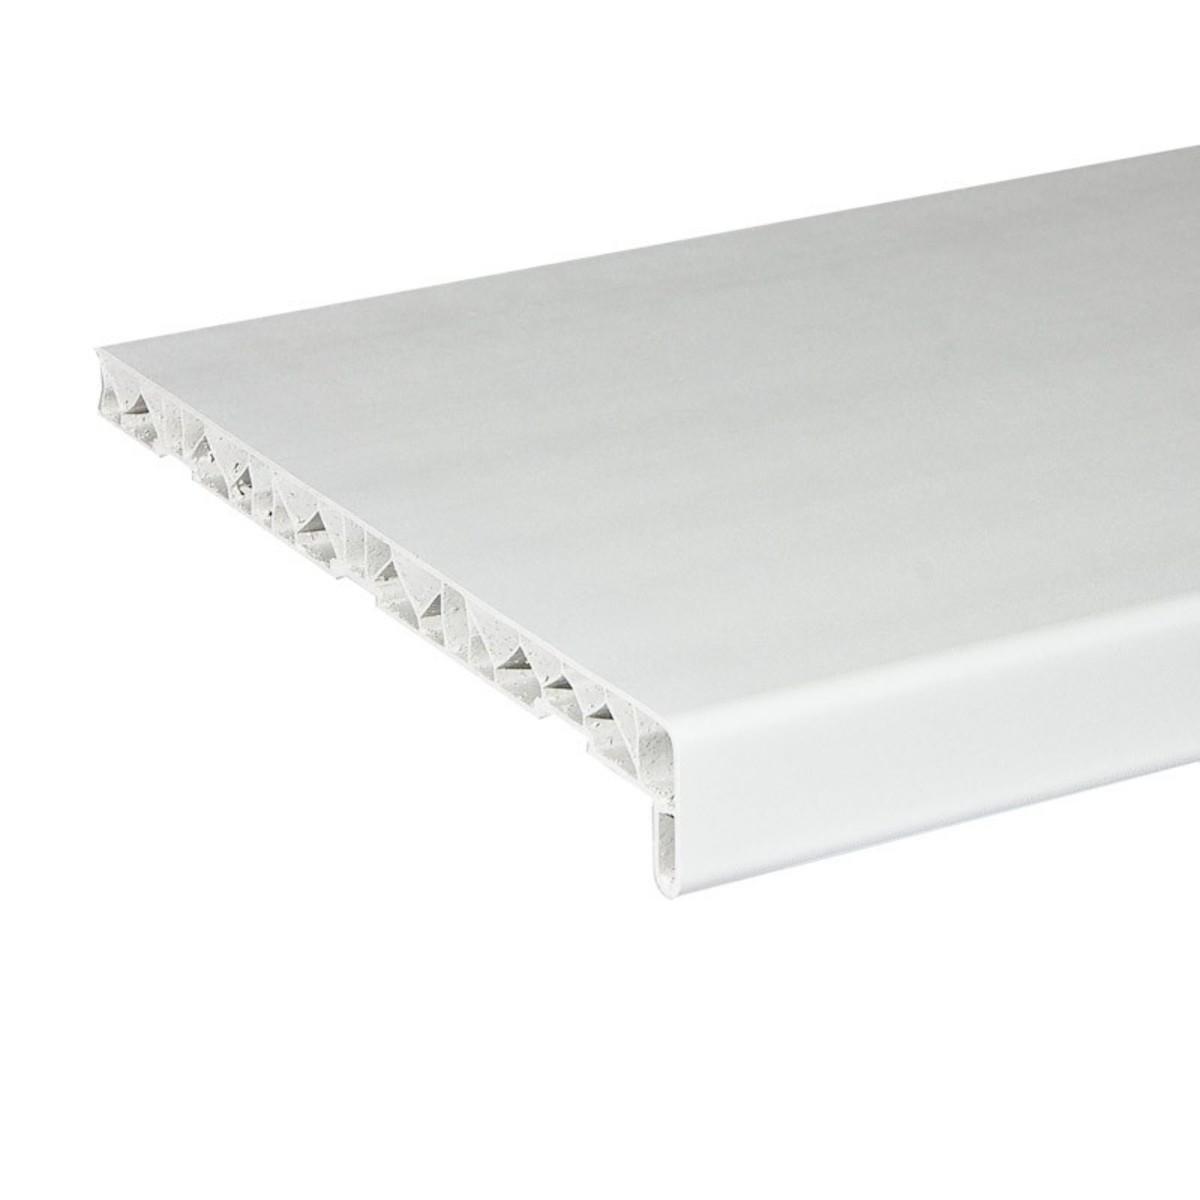 Подоконник ПВХ 300x1500 мм цвет белый